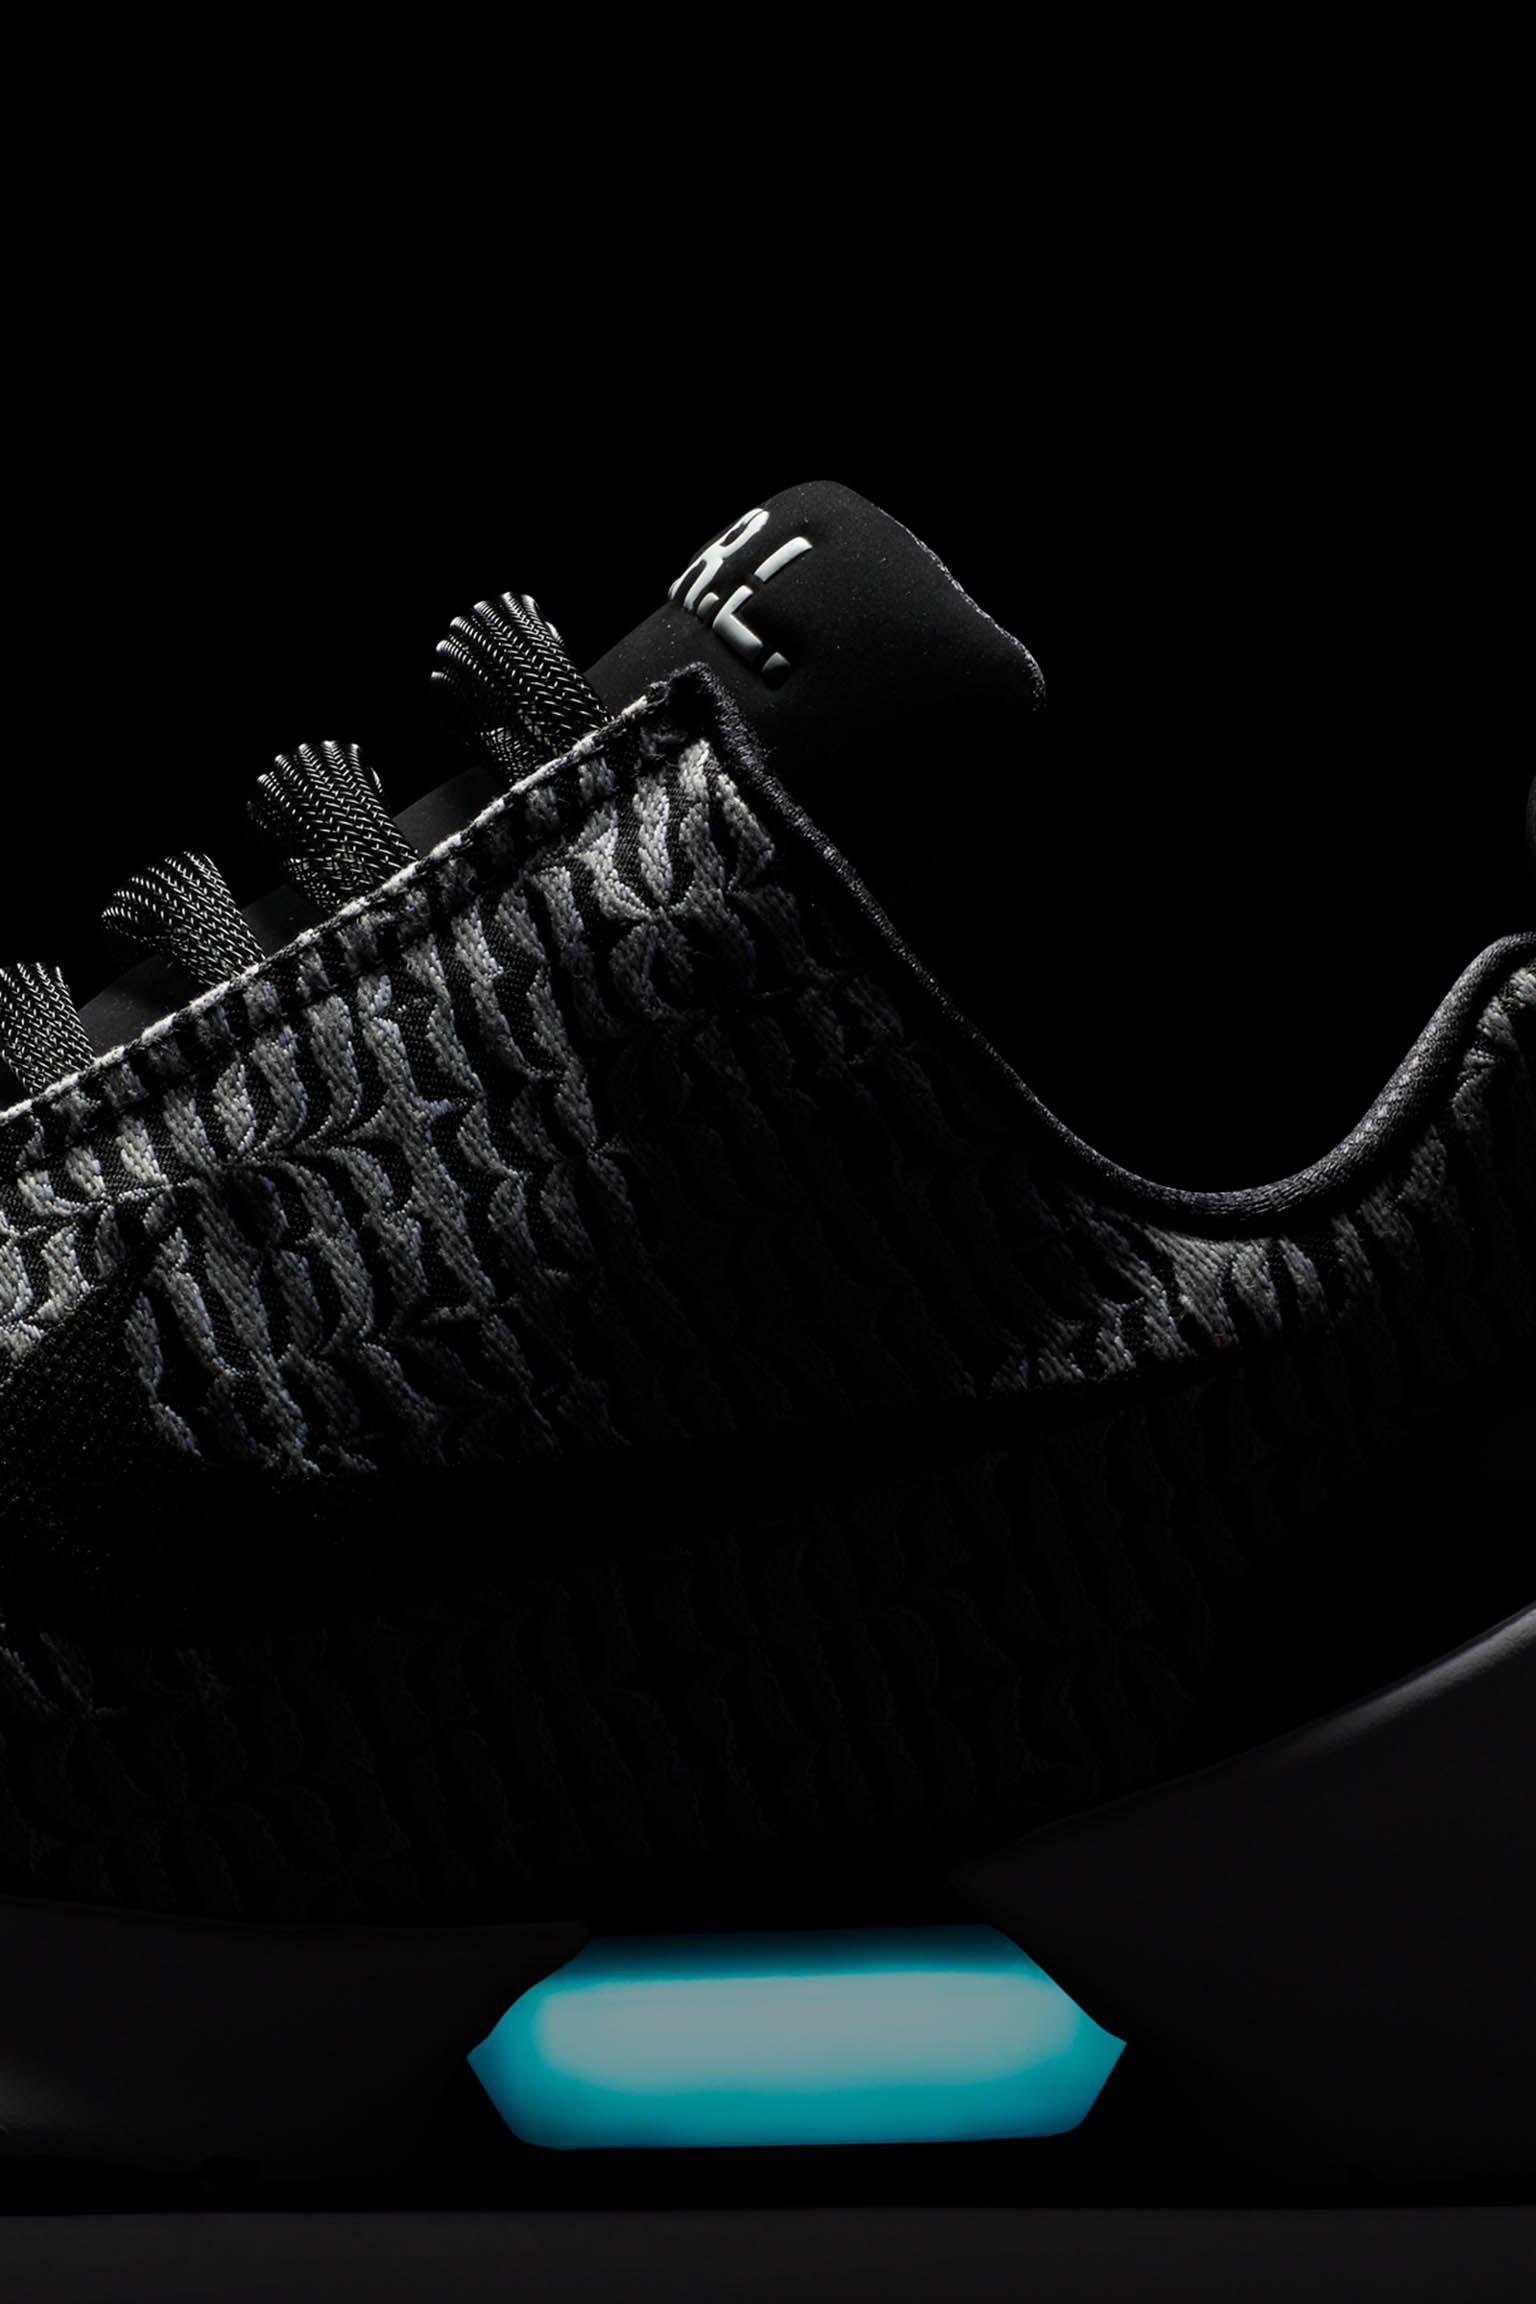 Nike HyperAdapt 1.0 'Black & Wolf Grey' Release Date